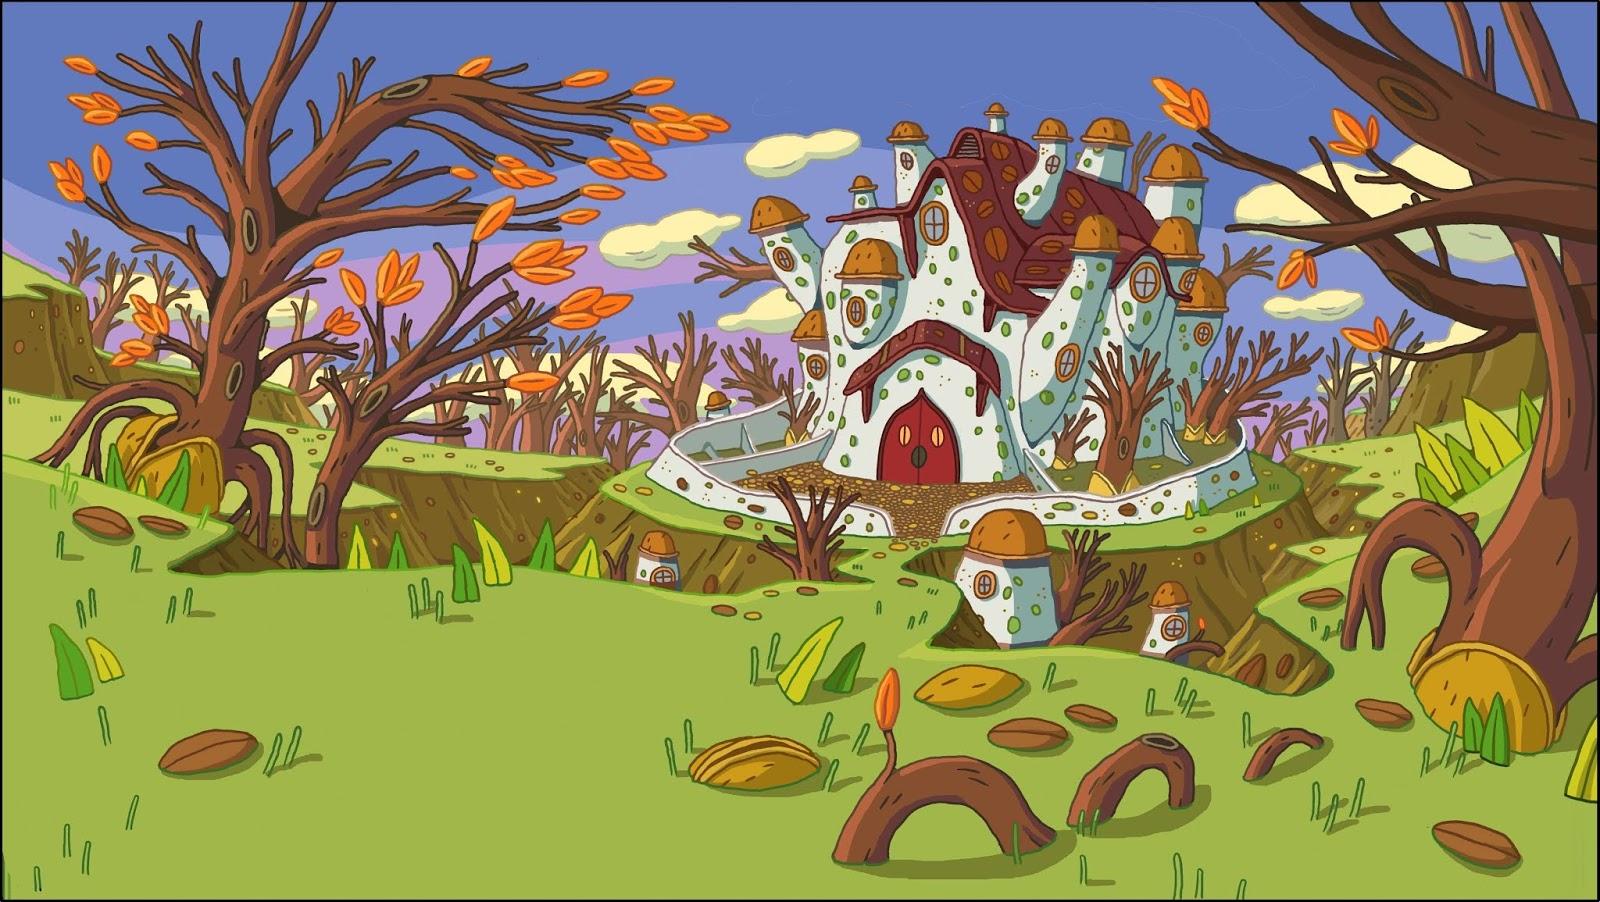 Pubg Wallpapers 67: 72 Adventure Time Wallpaper